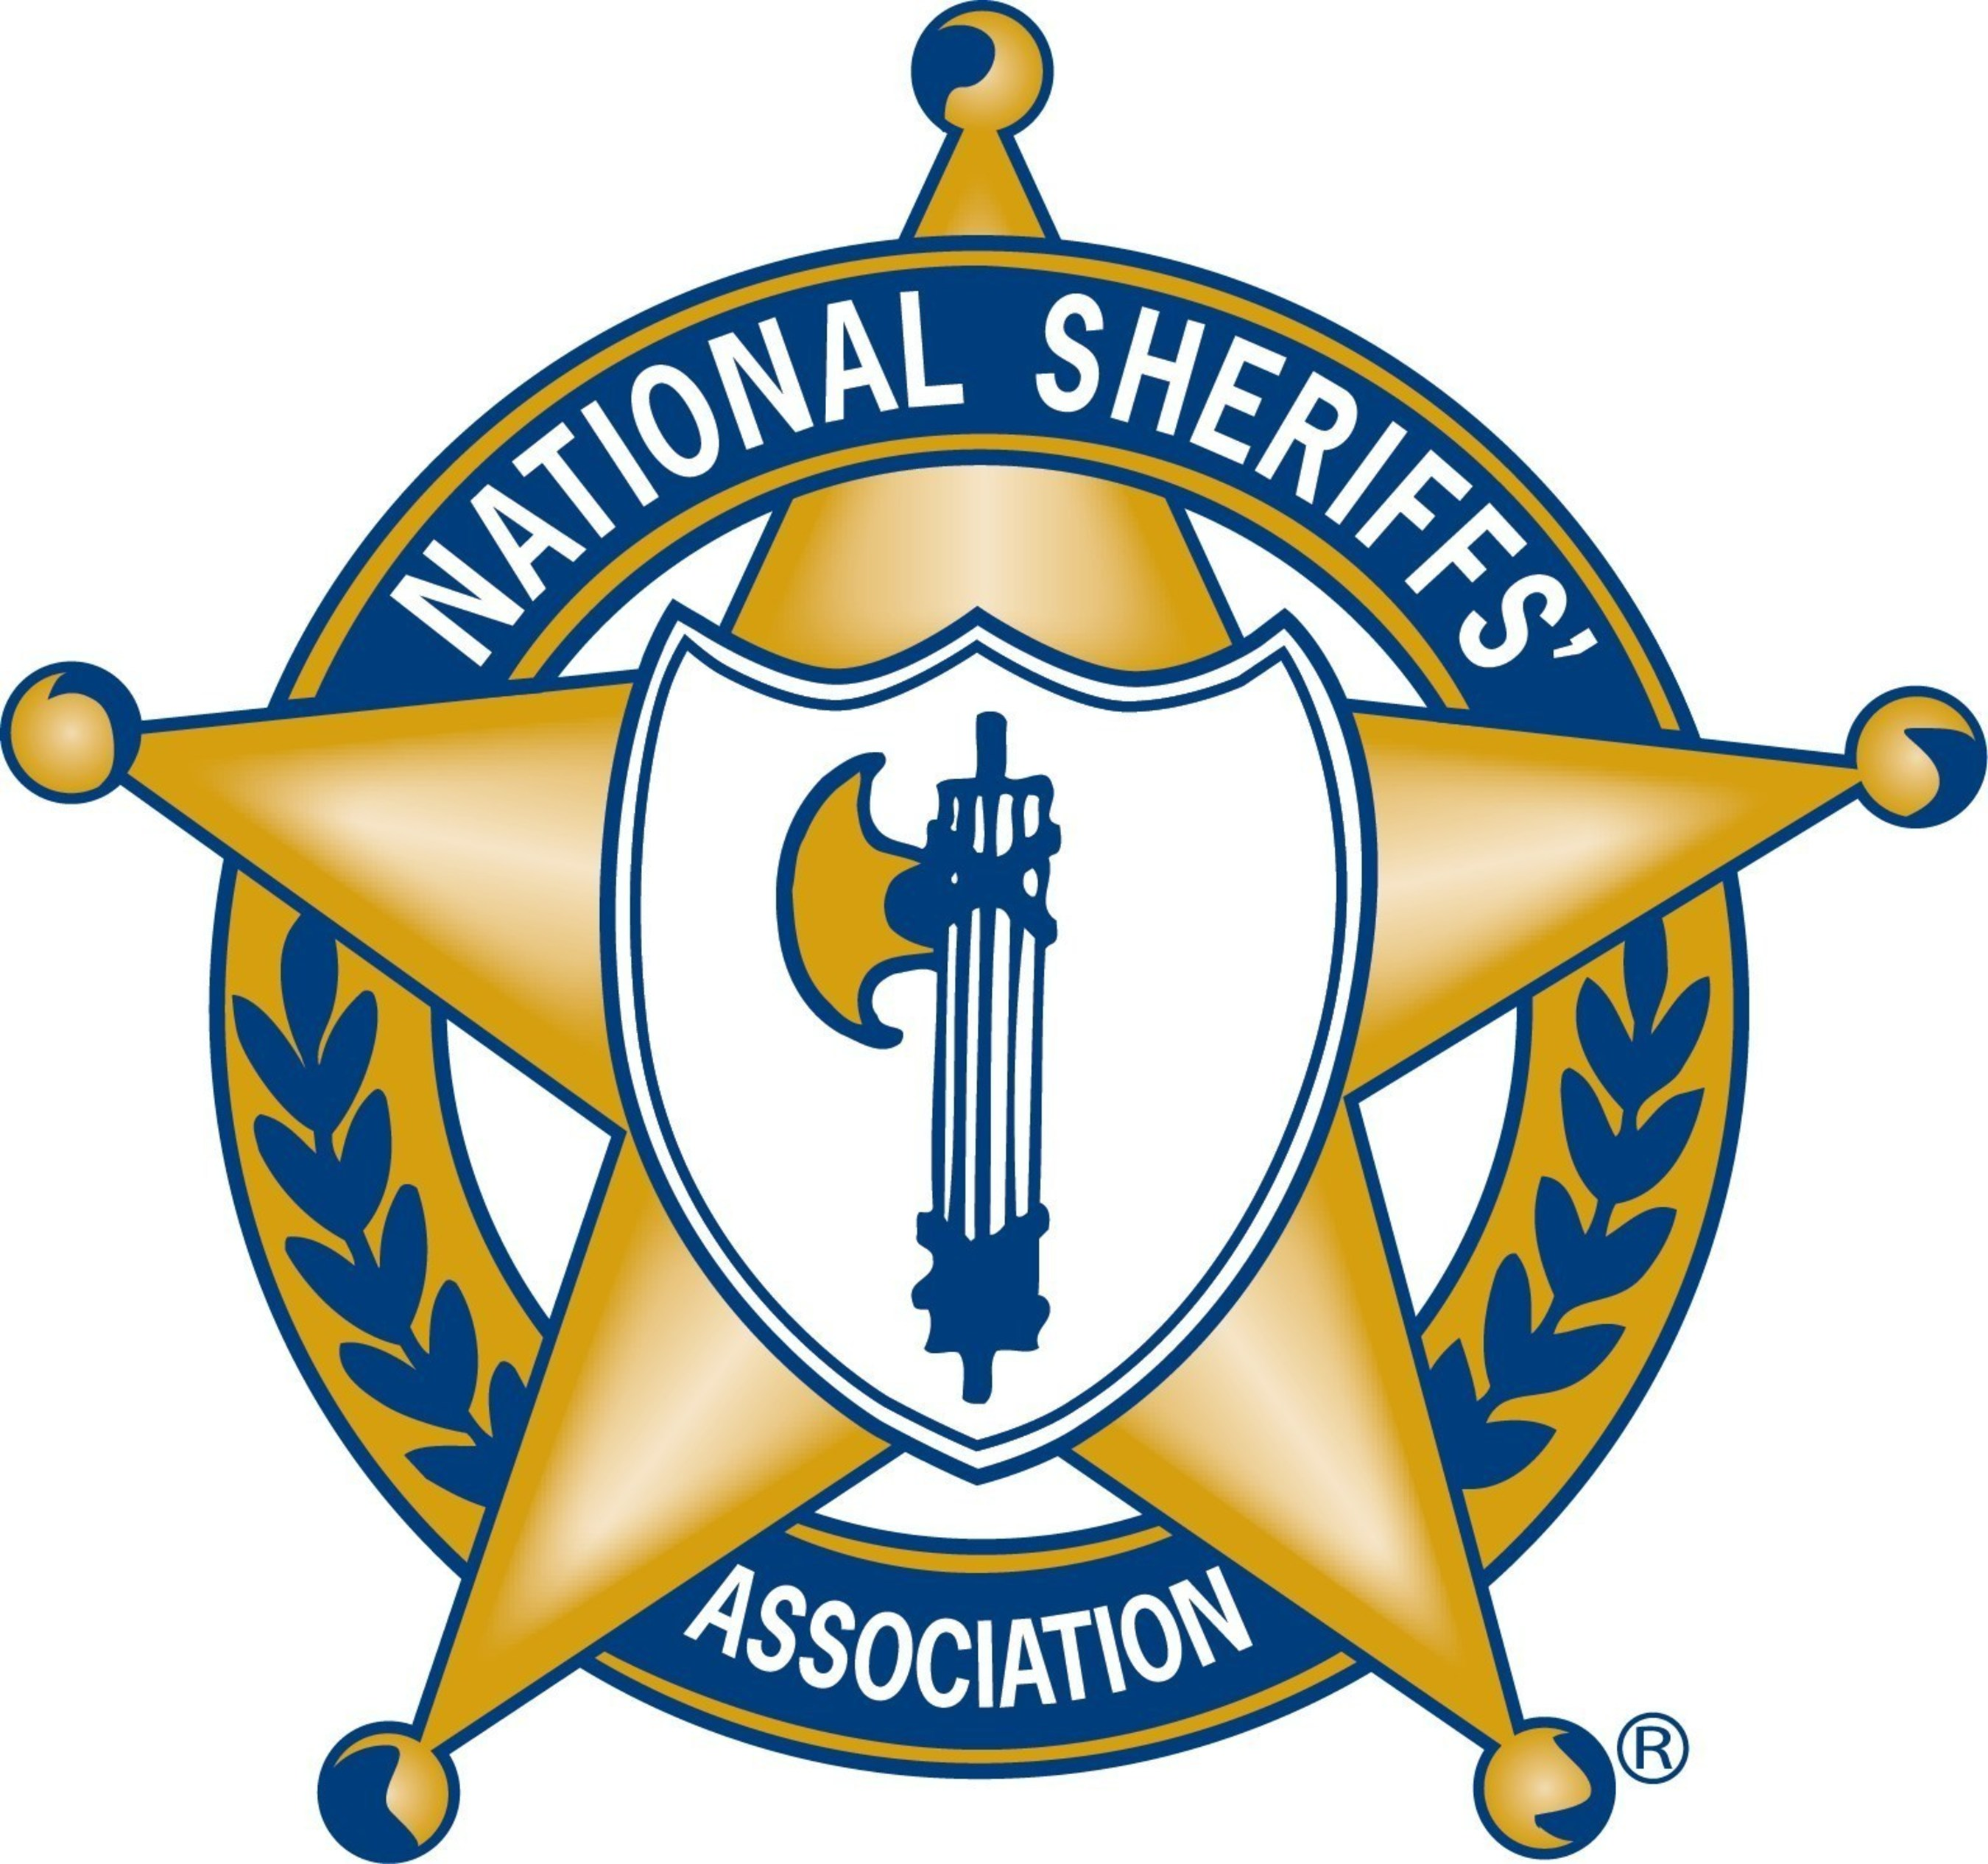 NATIONAL SHERIFFS' ASSOCIATION AND PURDUE PHARMA L.P. LEAD LAW ENFORCEMENT TRAINING ON NALOXONE PILOT PROGRAM TO PROVIDE OVERDOSE NALOXONE KITS TO CERTAIN JURISDICTIONS